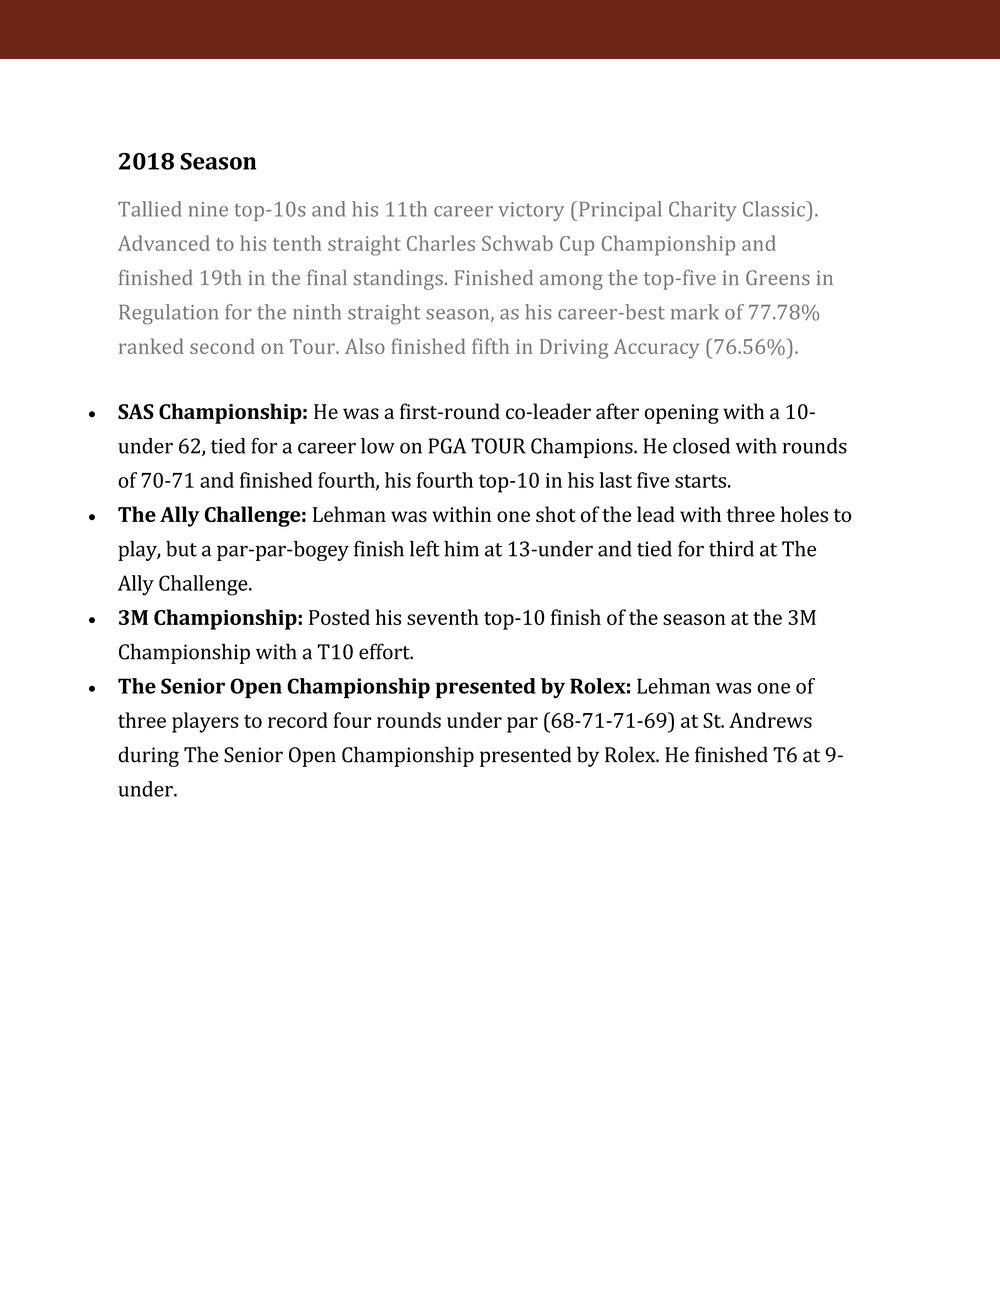 LDG Bio feb 2019_Page_04.jpg